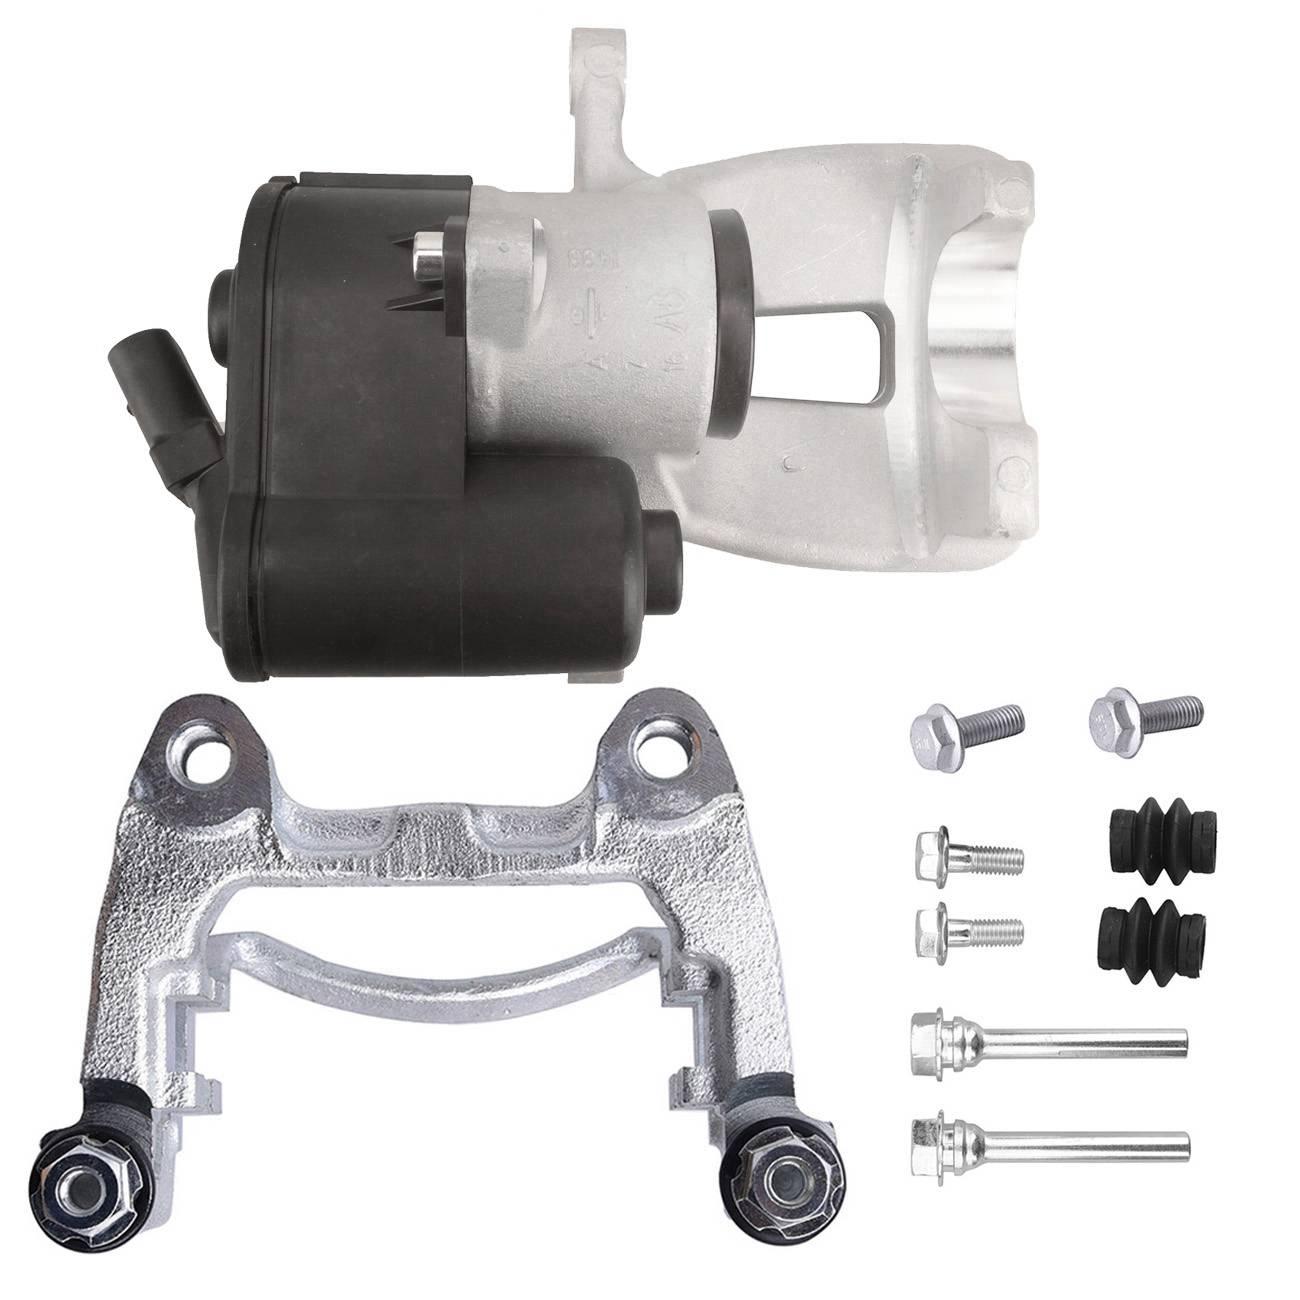 Bapmic-Set-Rear-Left-Brake-Caliper-Brake-System-for-BMW-114i-116i-125i-420i thumbnail 2